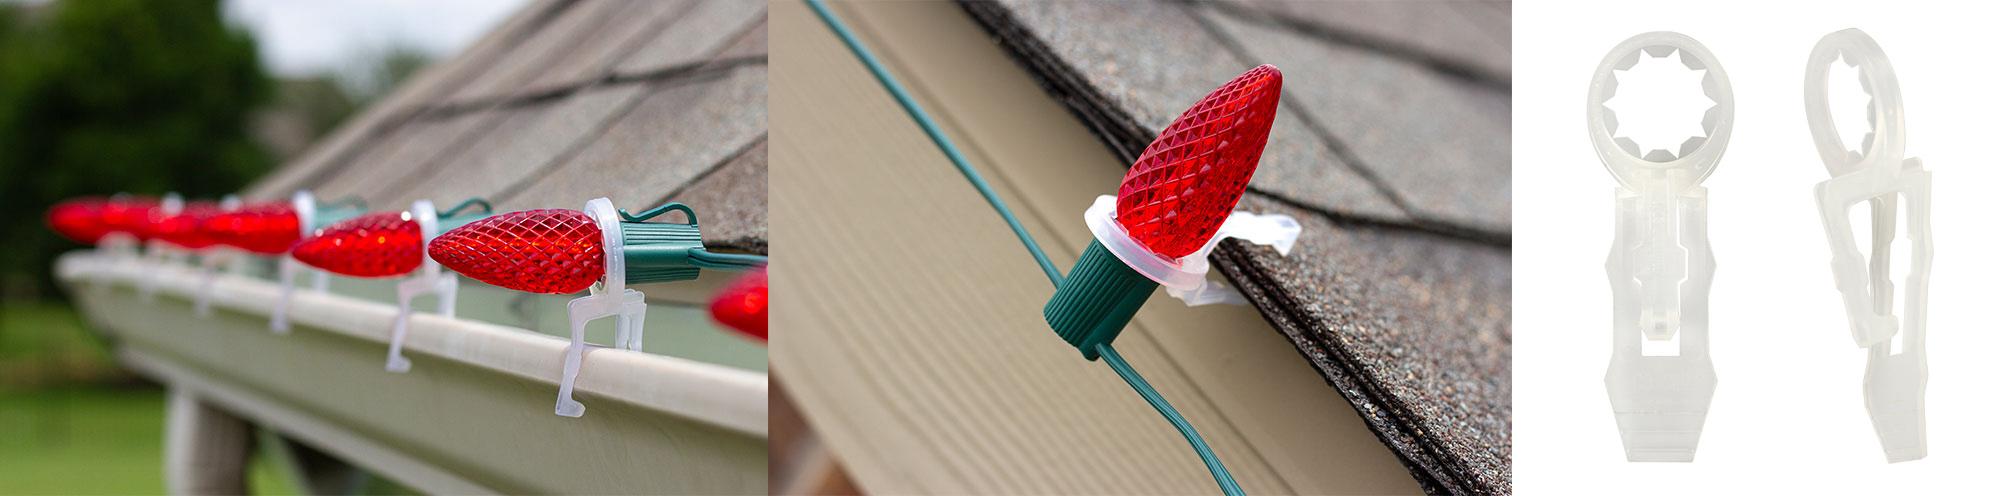 minleon tuff christmas light clip